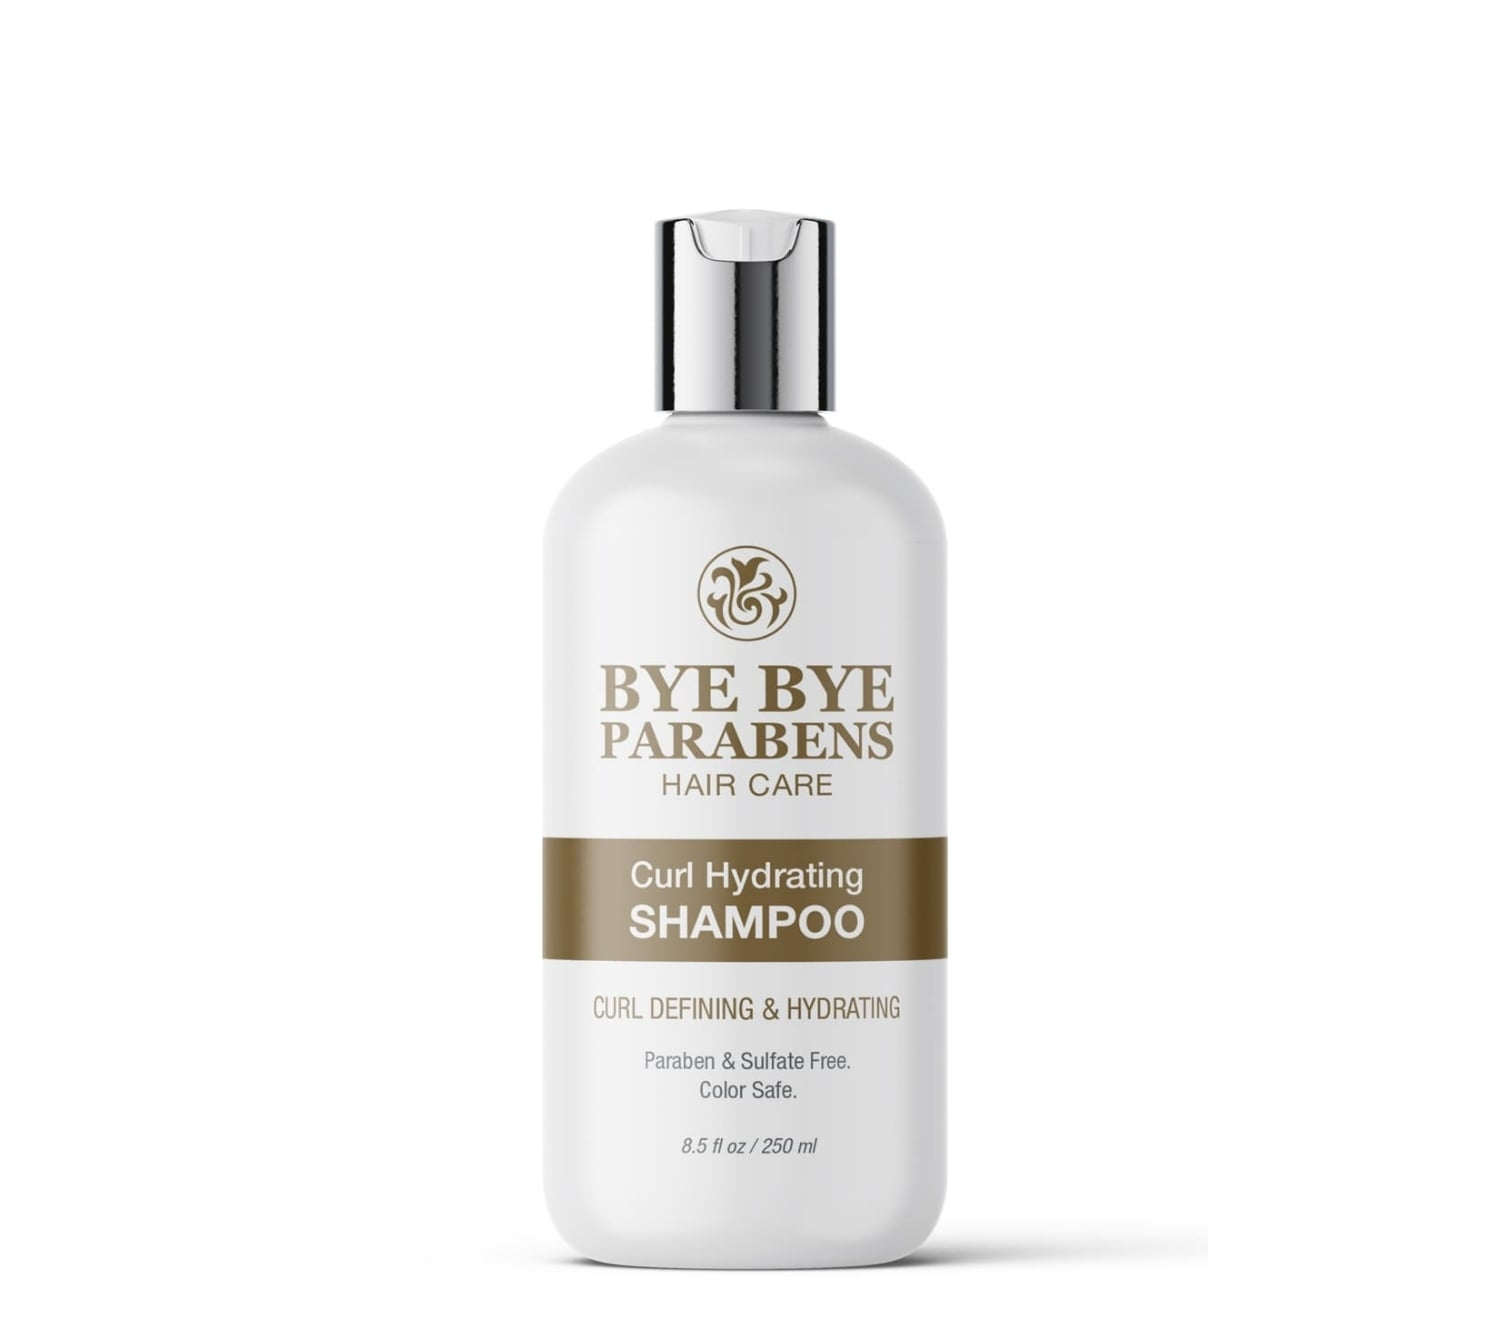 Natural hair curl hydrating shampoo Bye Bye Parabens